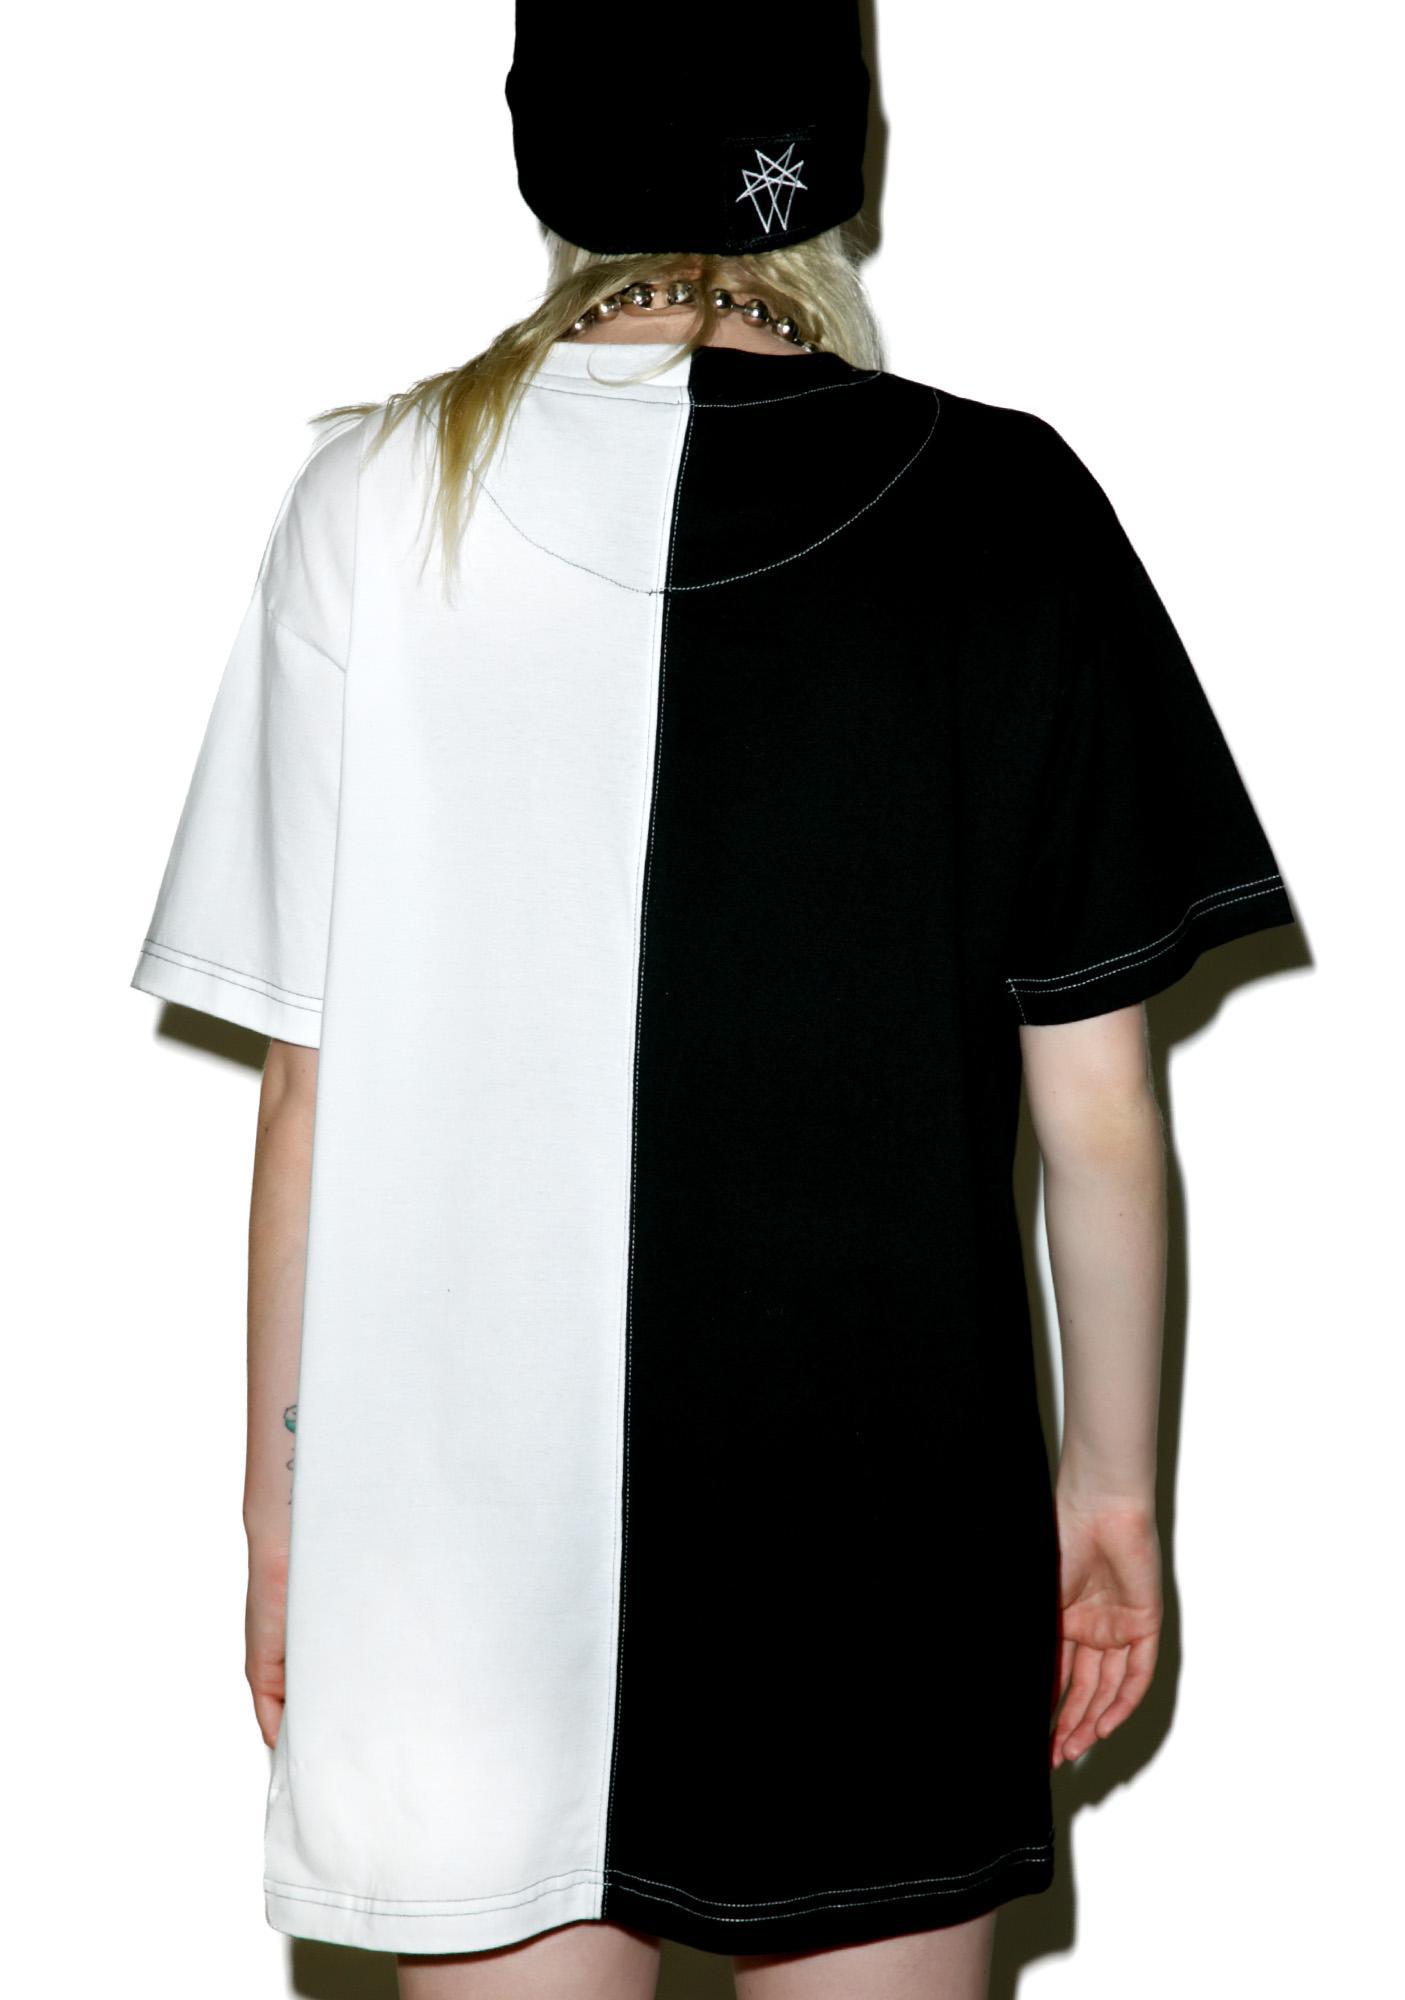 Long Clothing x Mishka Chain Two Tone Tee